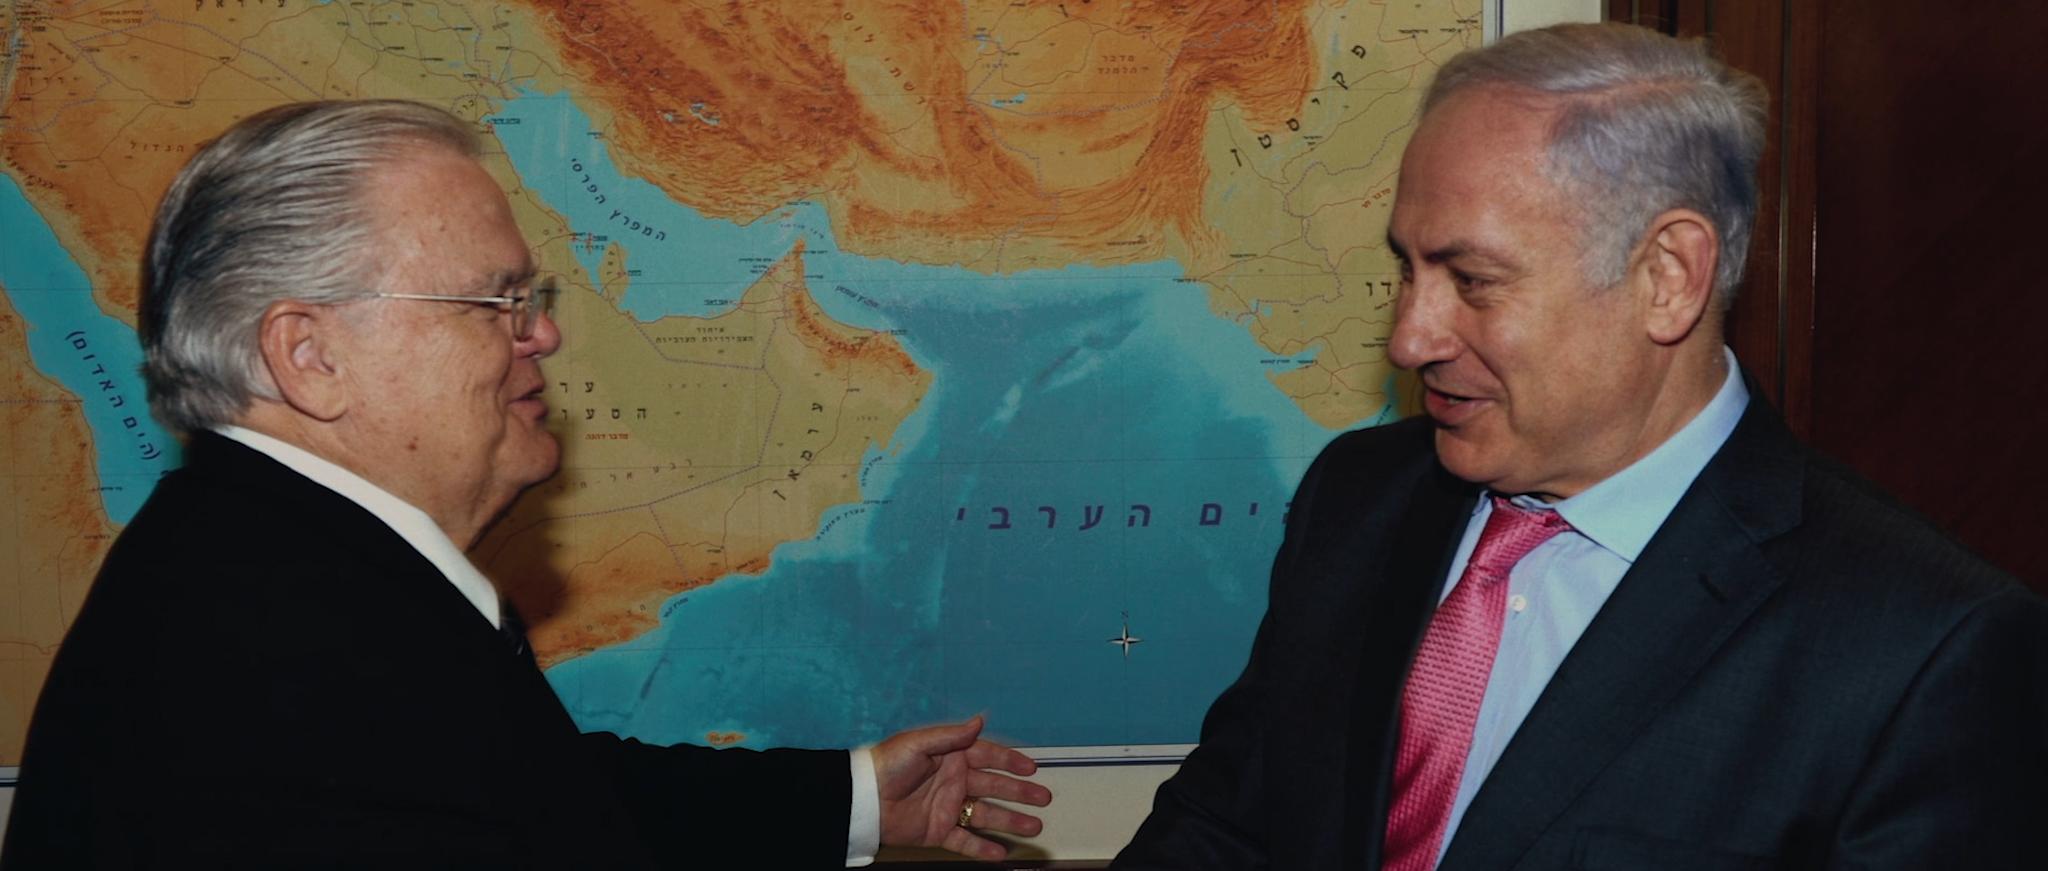 Pastor John Hagee from Christians United for Israel and Israeli PM Benjamin Netanyahu [Til Kingdom Come]